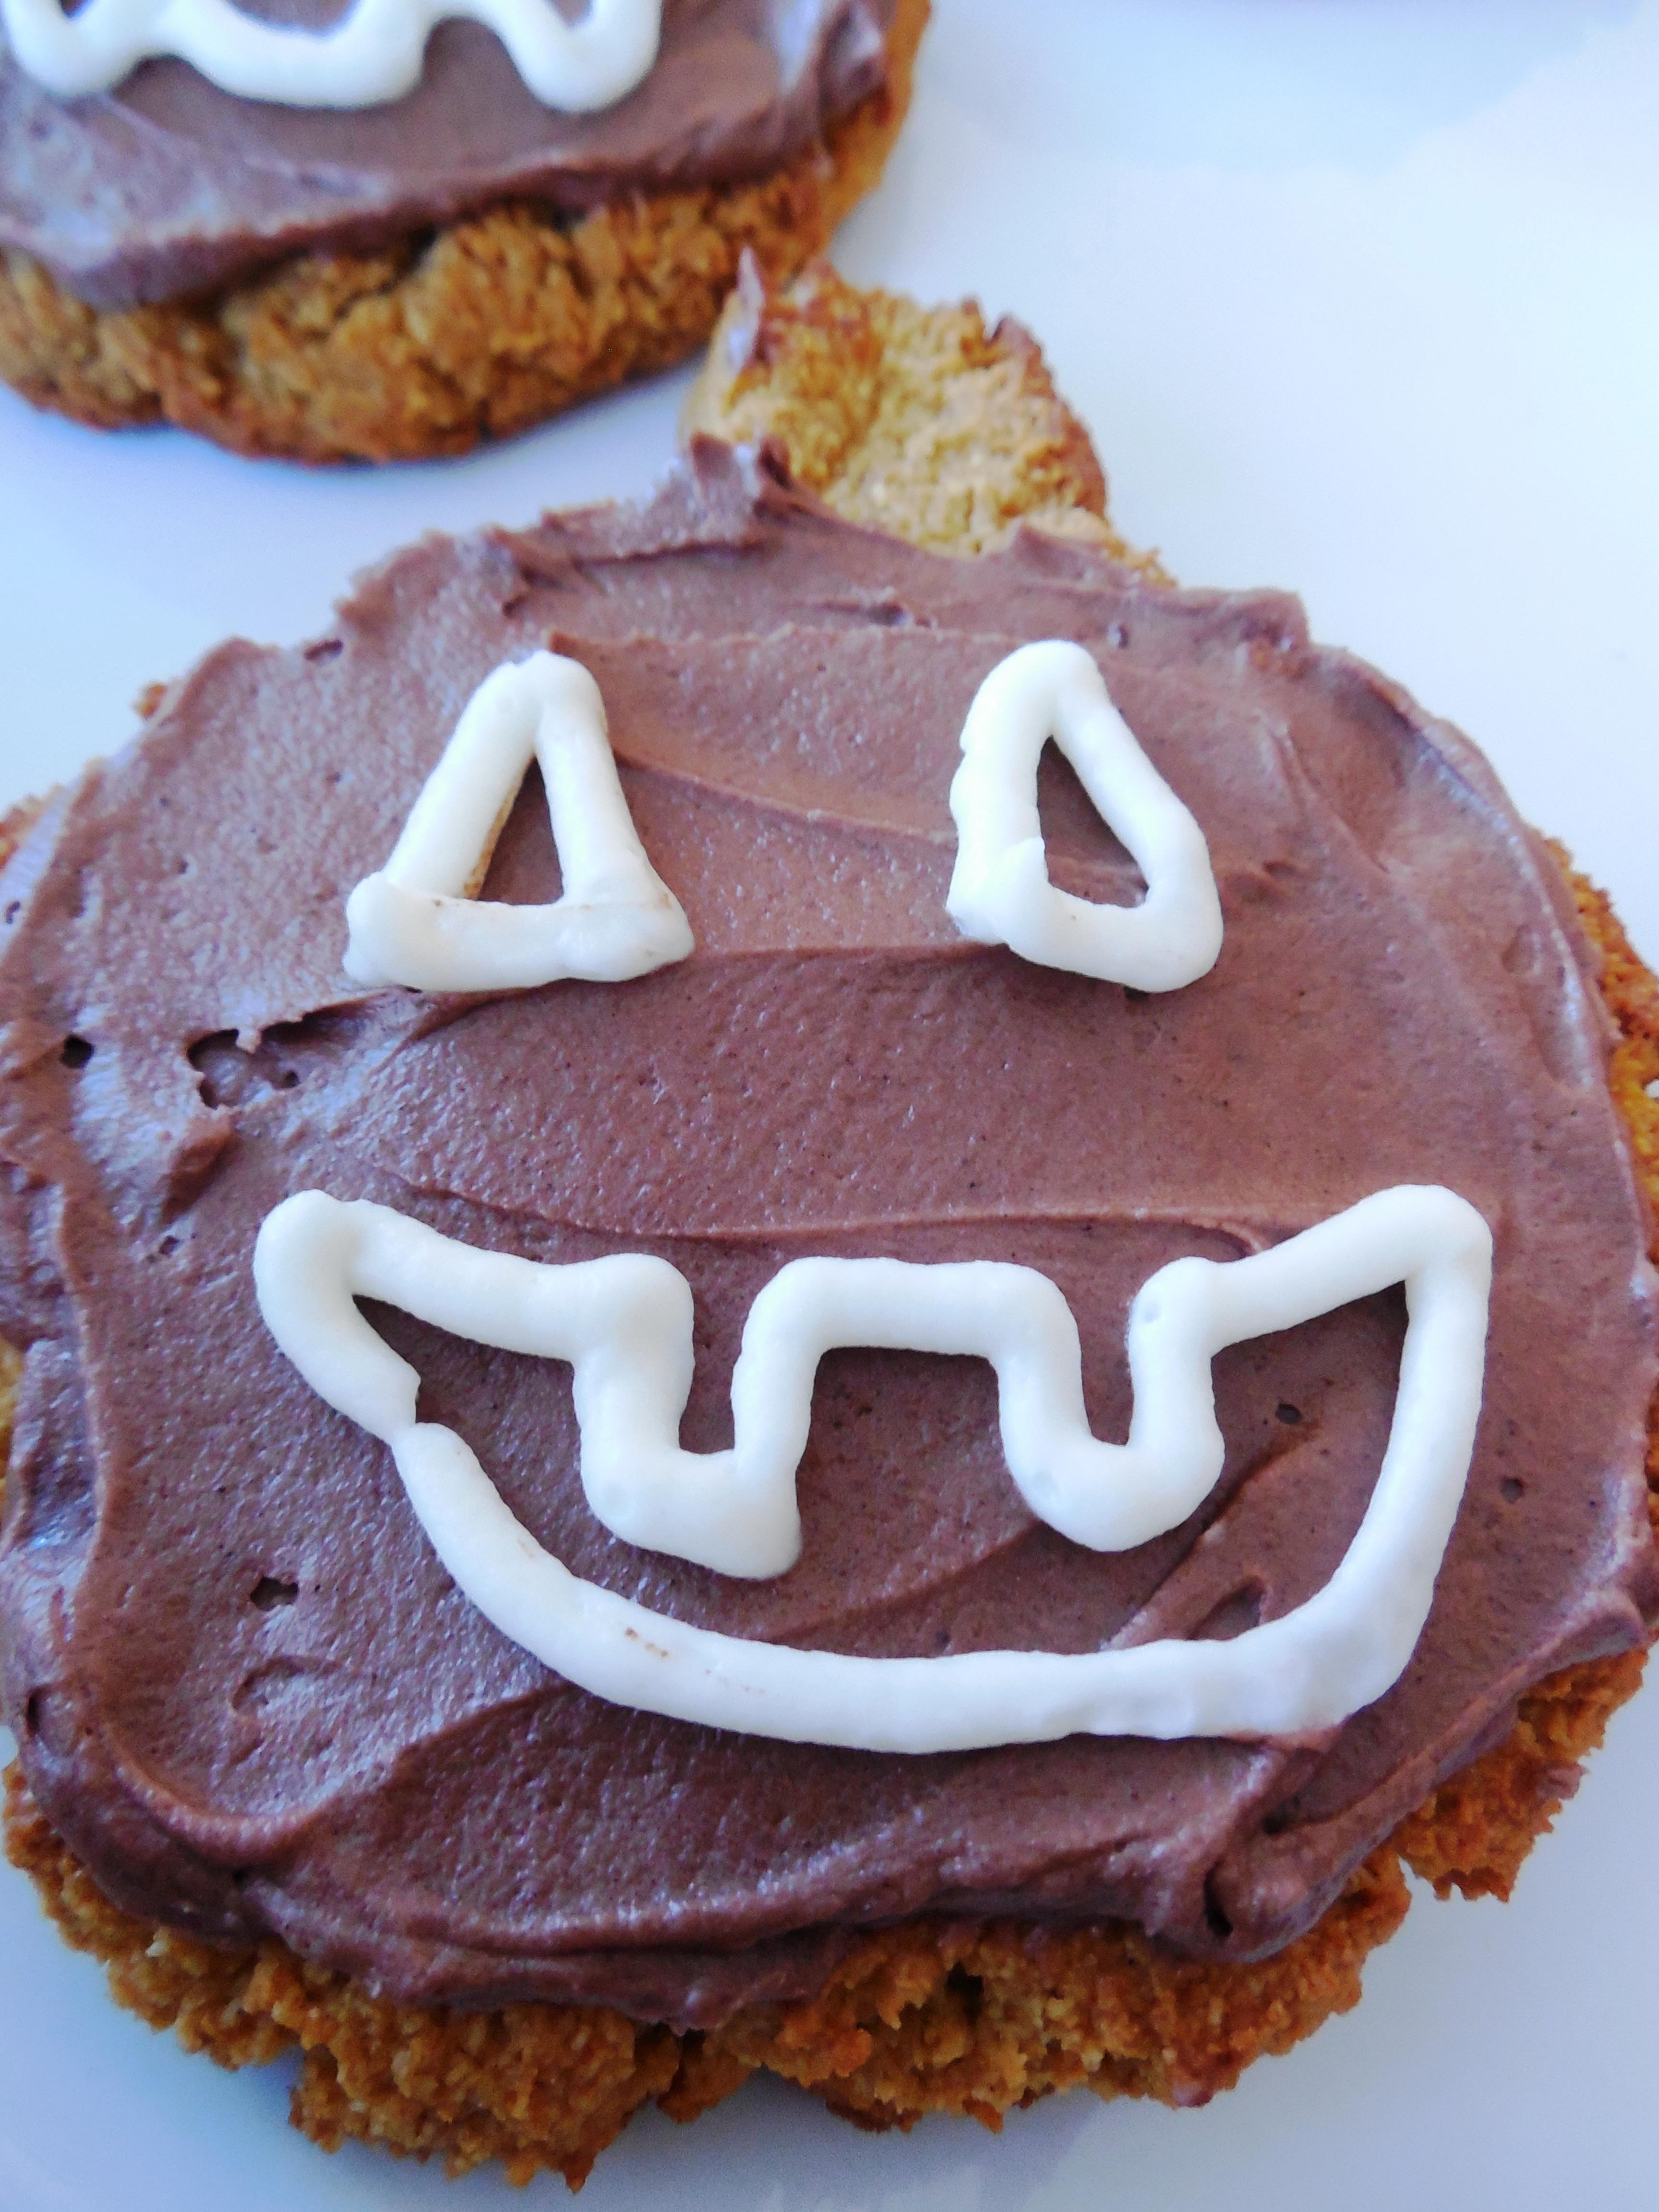 Frosted Jackolantern Pumpkin Cookie - Grain Free